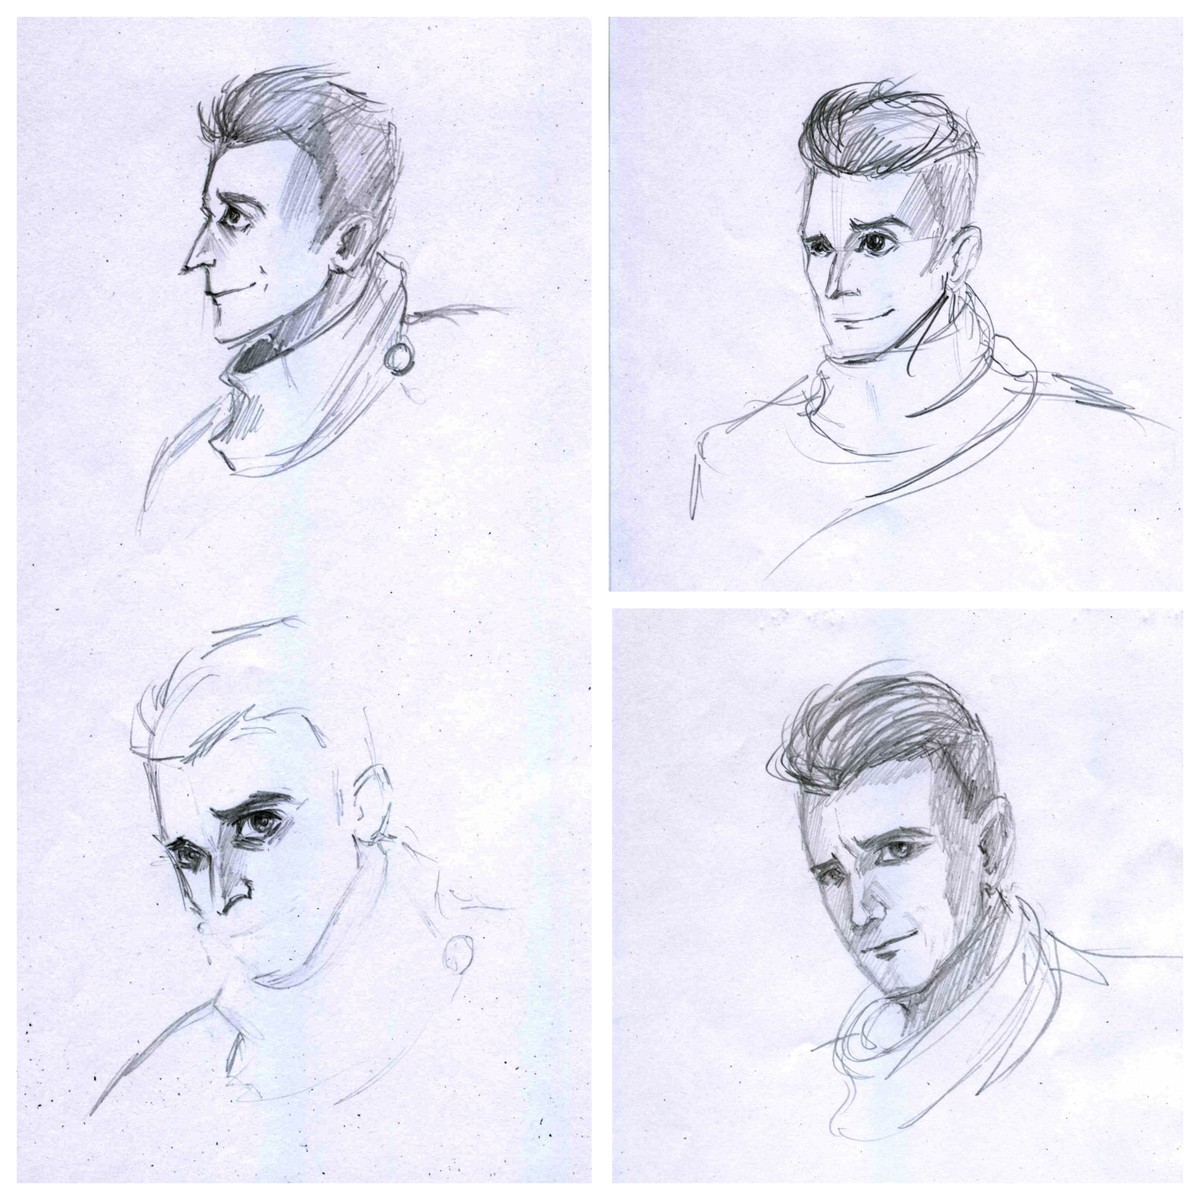 Этапы создания персонажа